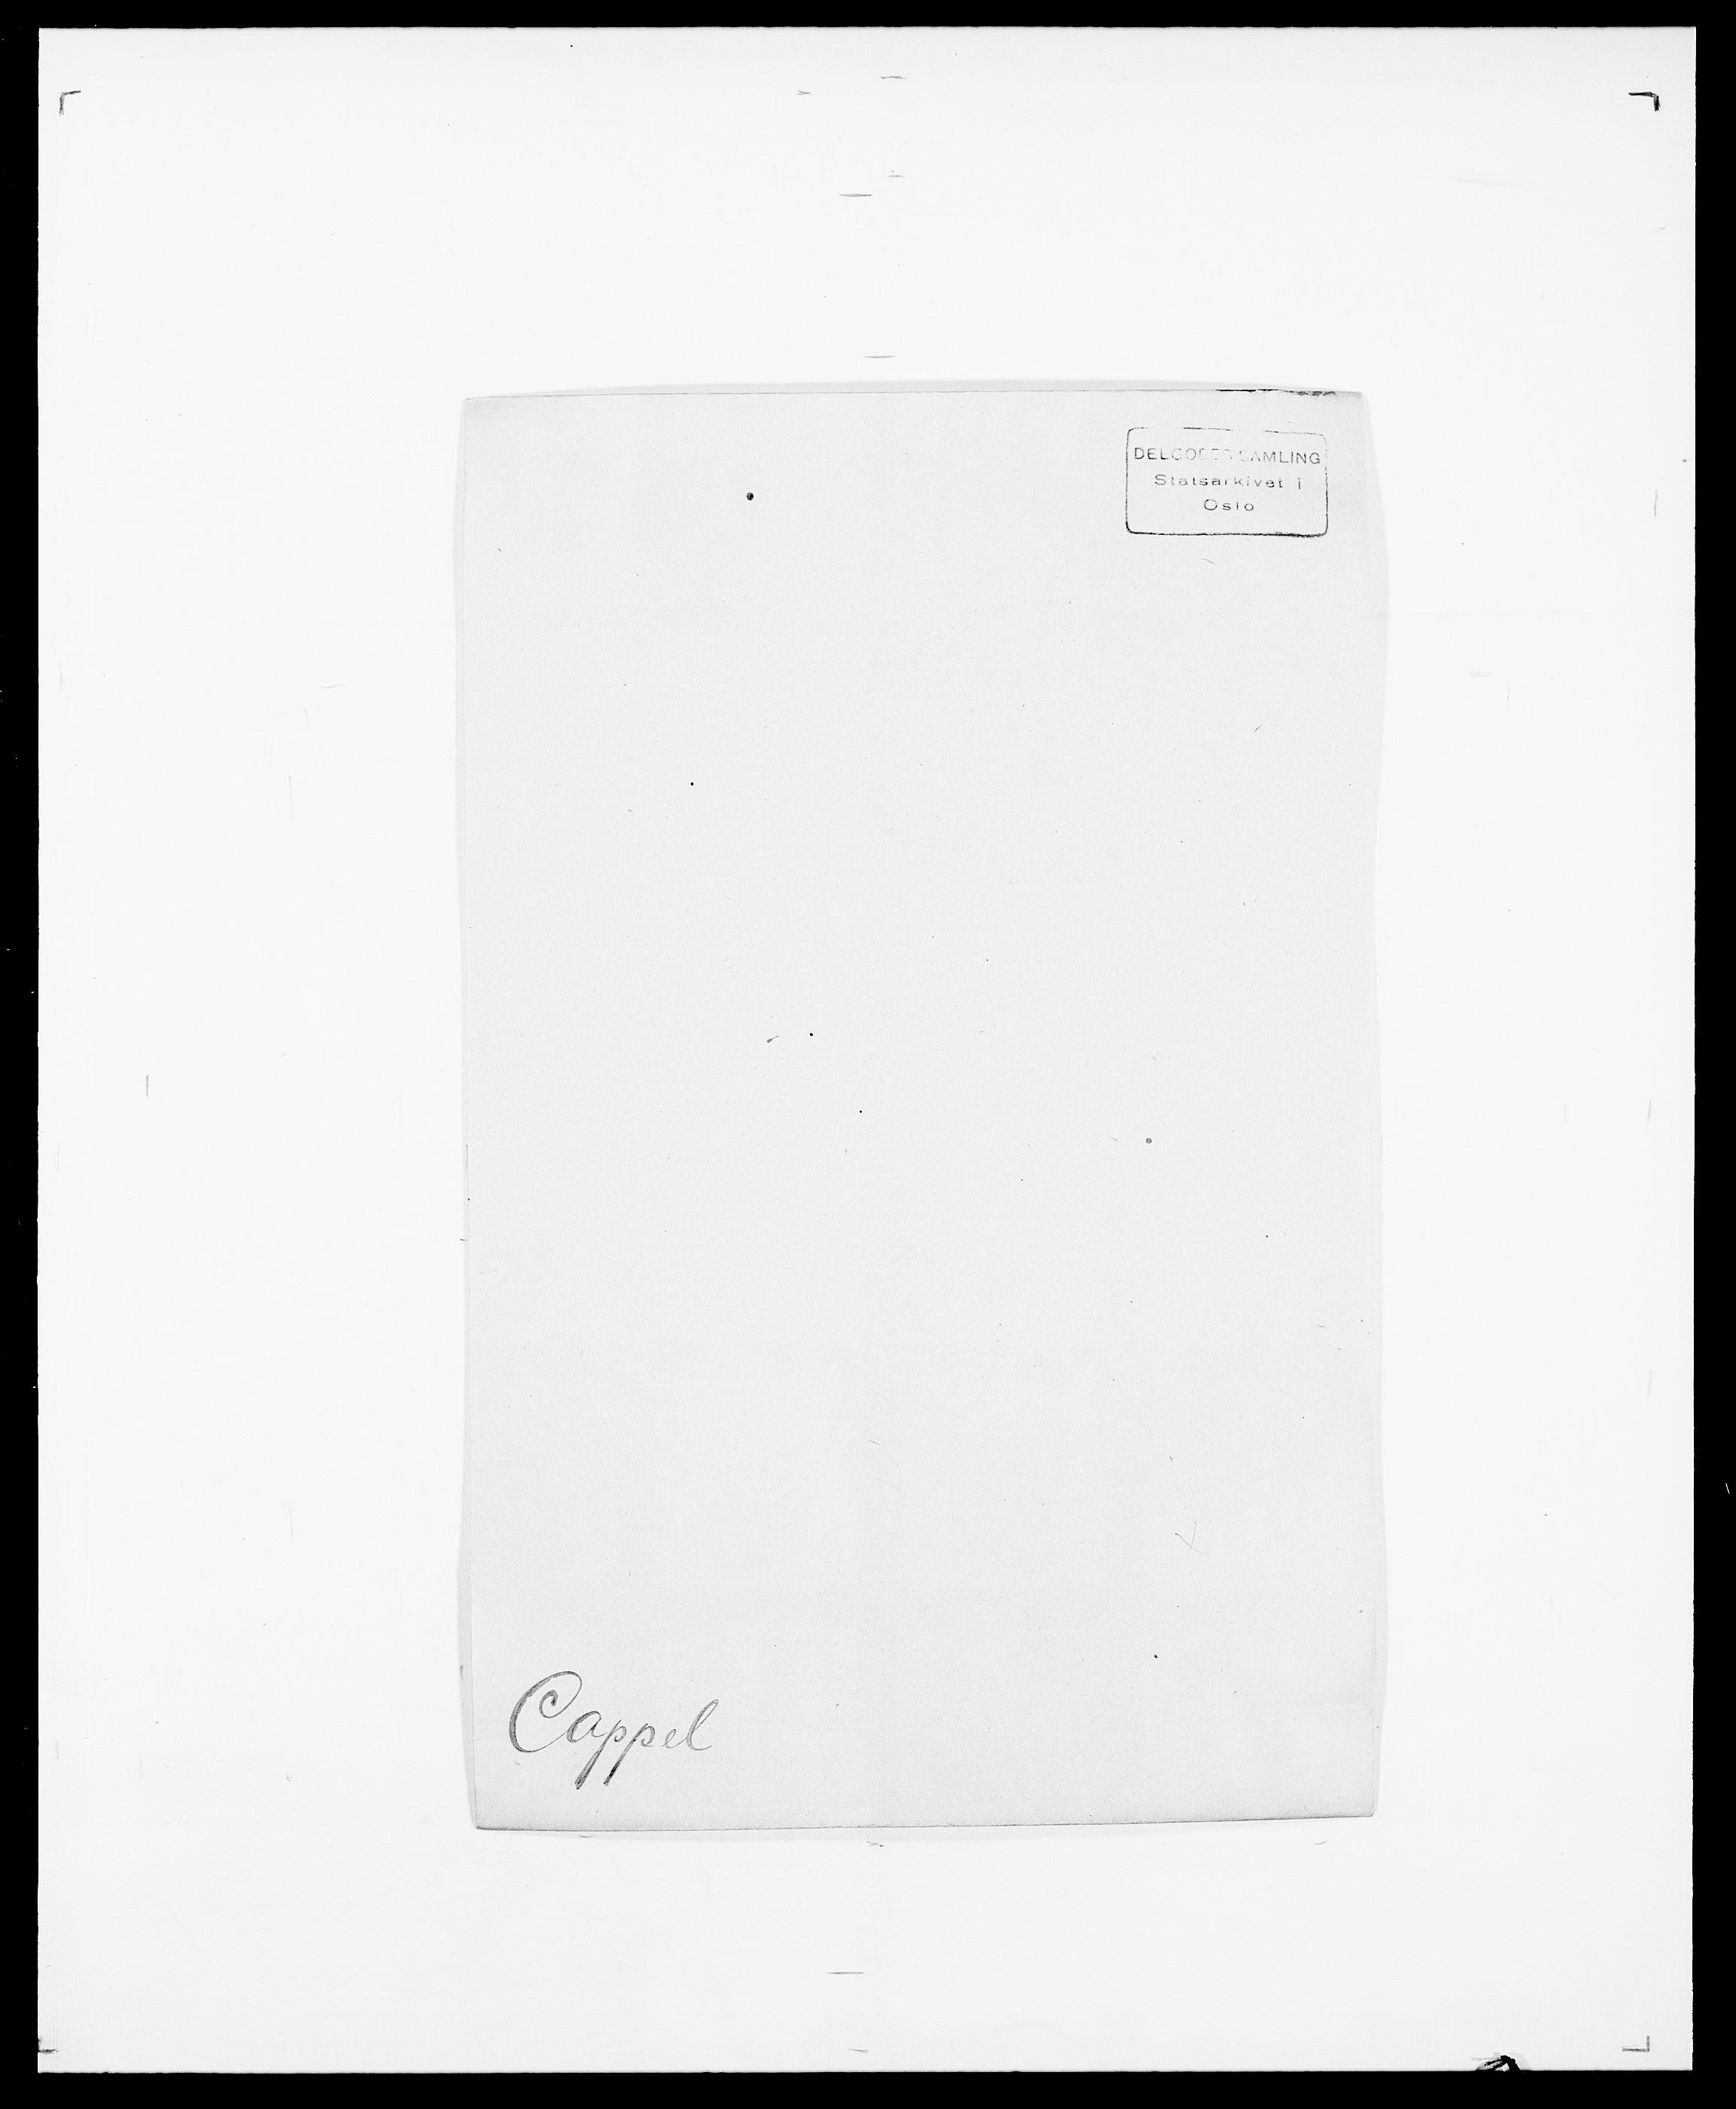 SAO, Delgobe, Charles Antoine - samling, D/Da/L0008: Capjon - Dagenbolt, s. 9